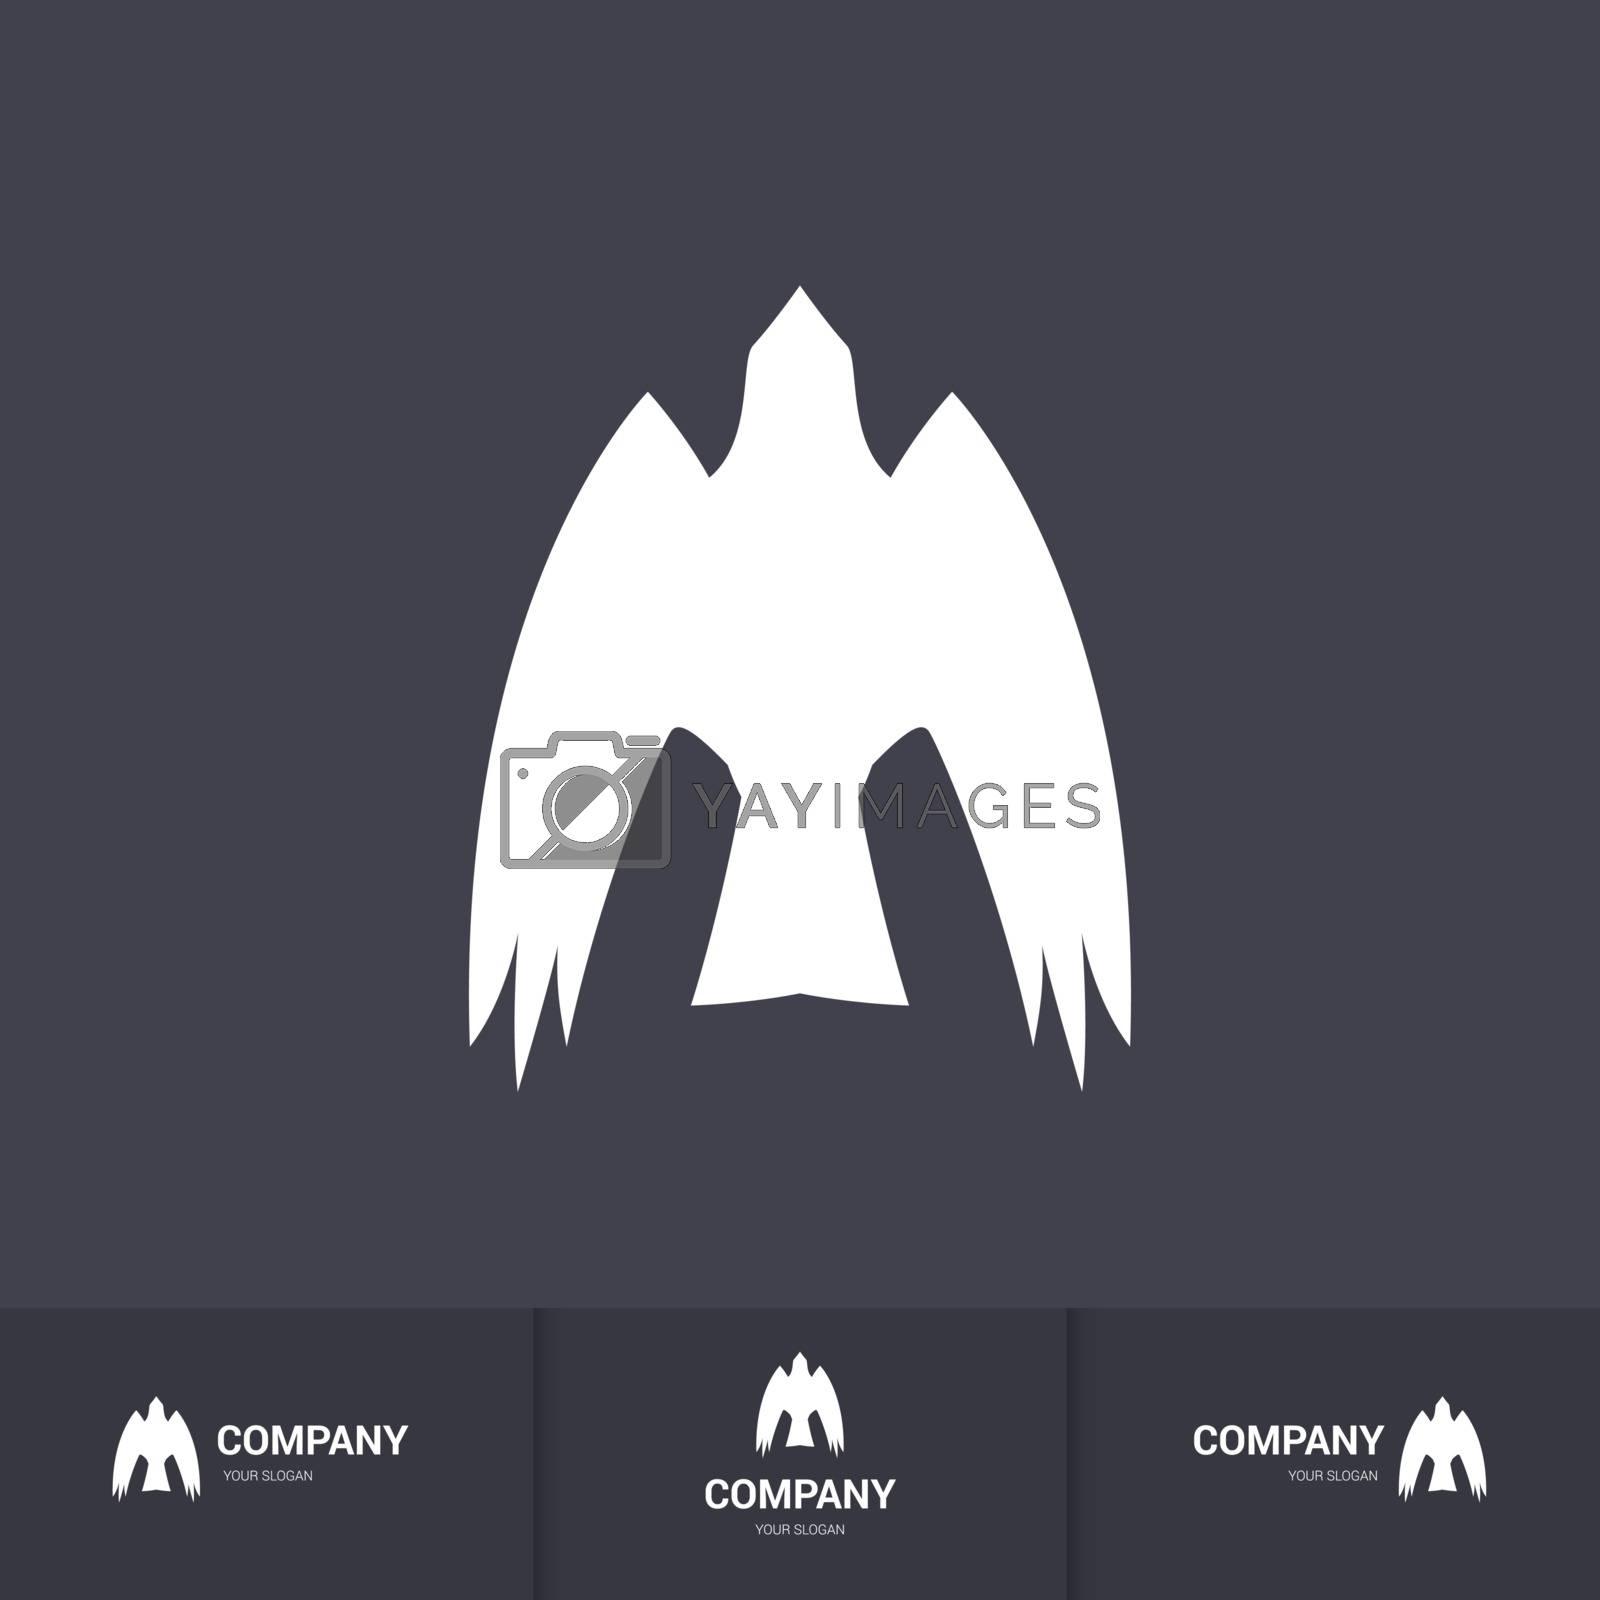 Stylized White Bird of Prey for Mascot Logo Template on Dark